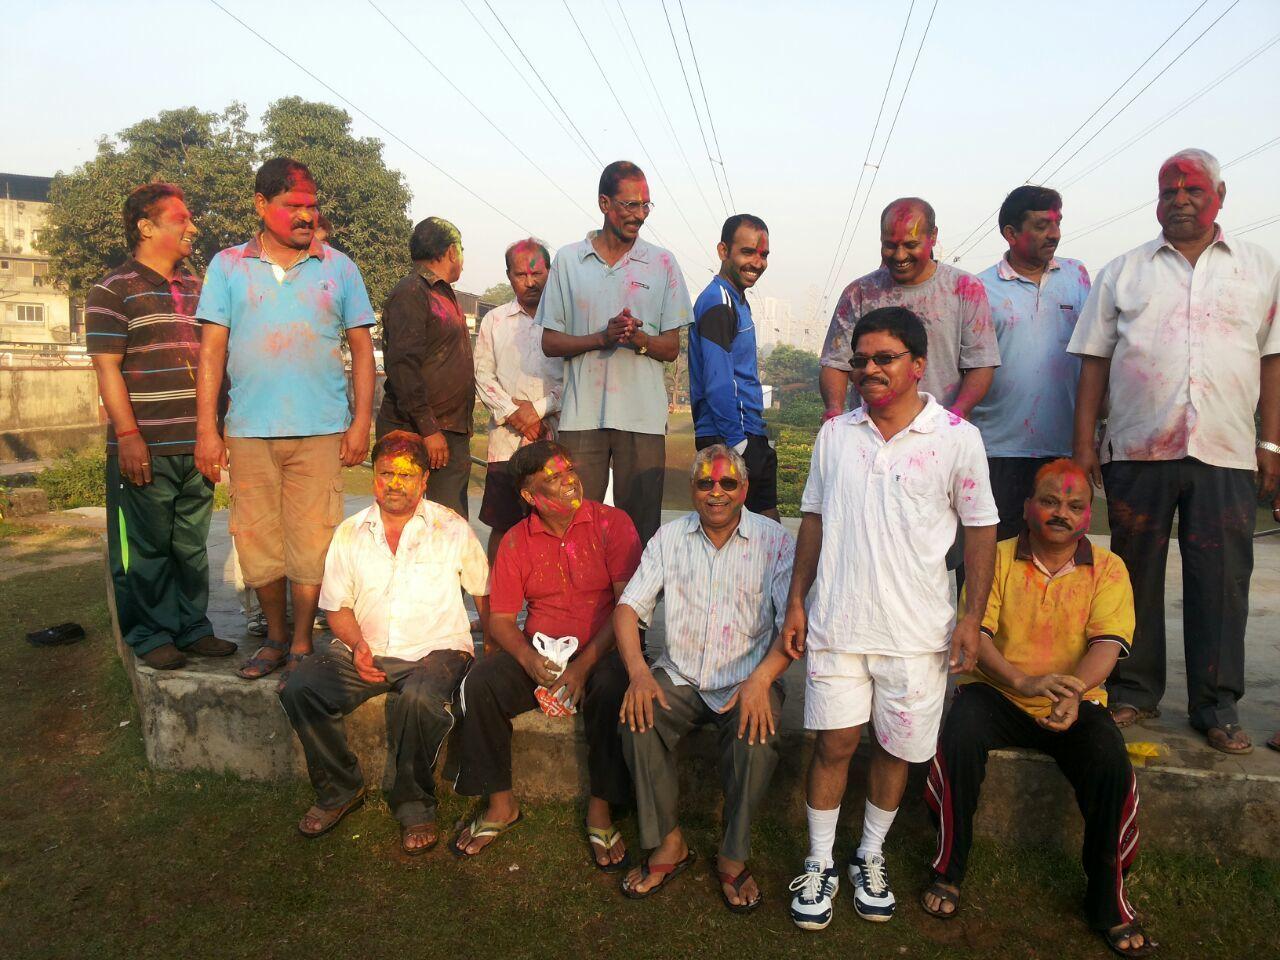 Holi News: RSS Swayamsevaks Celebrated Holi, The Festival Of Colours